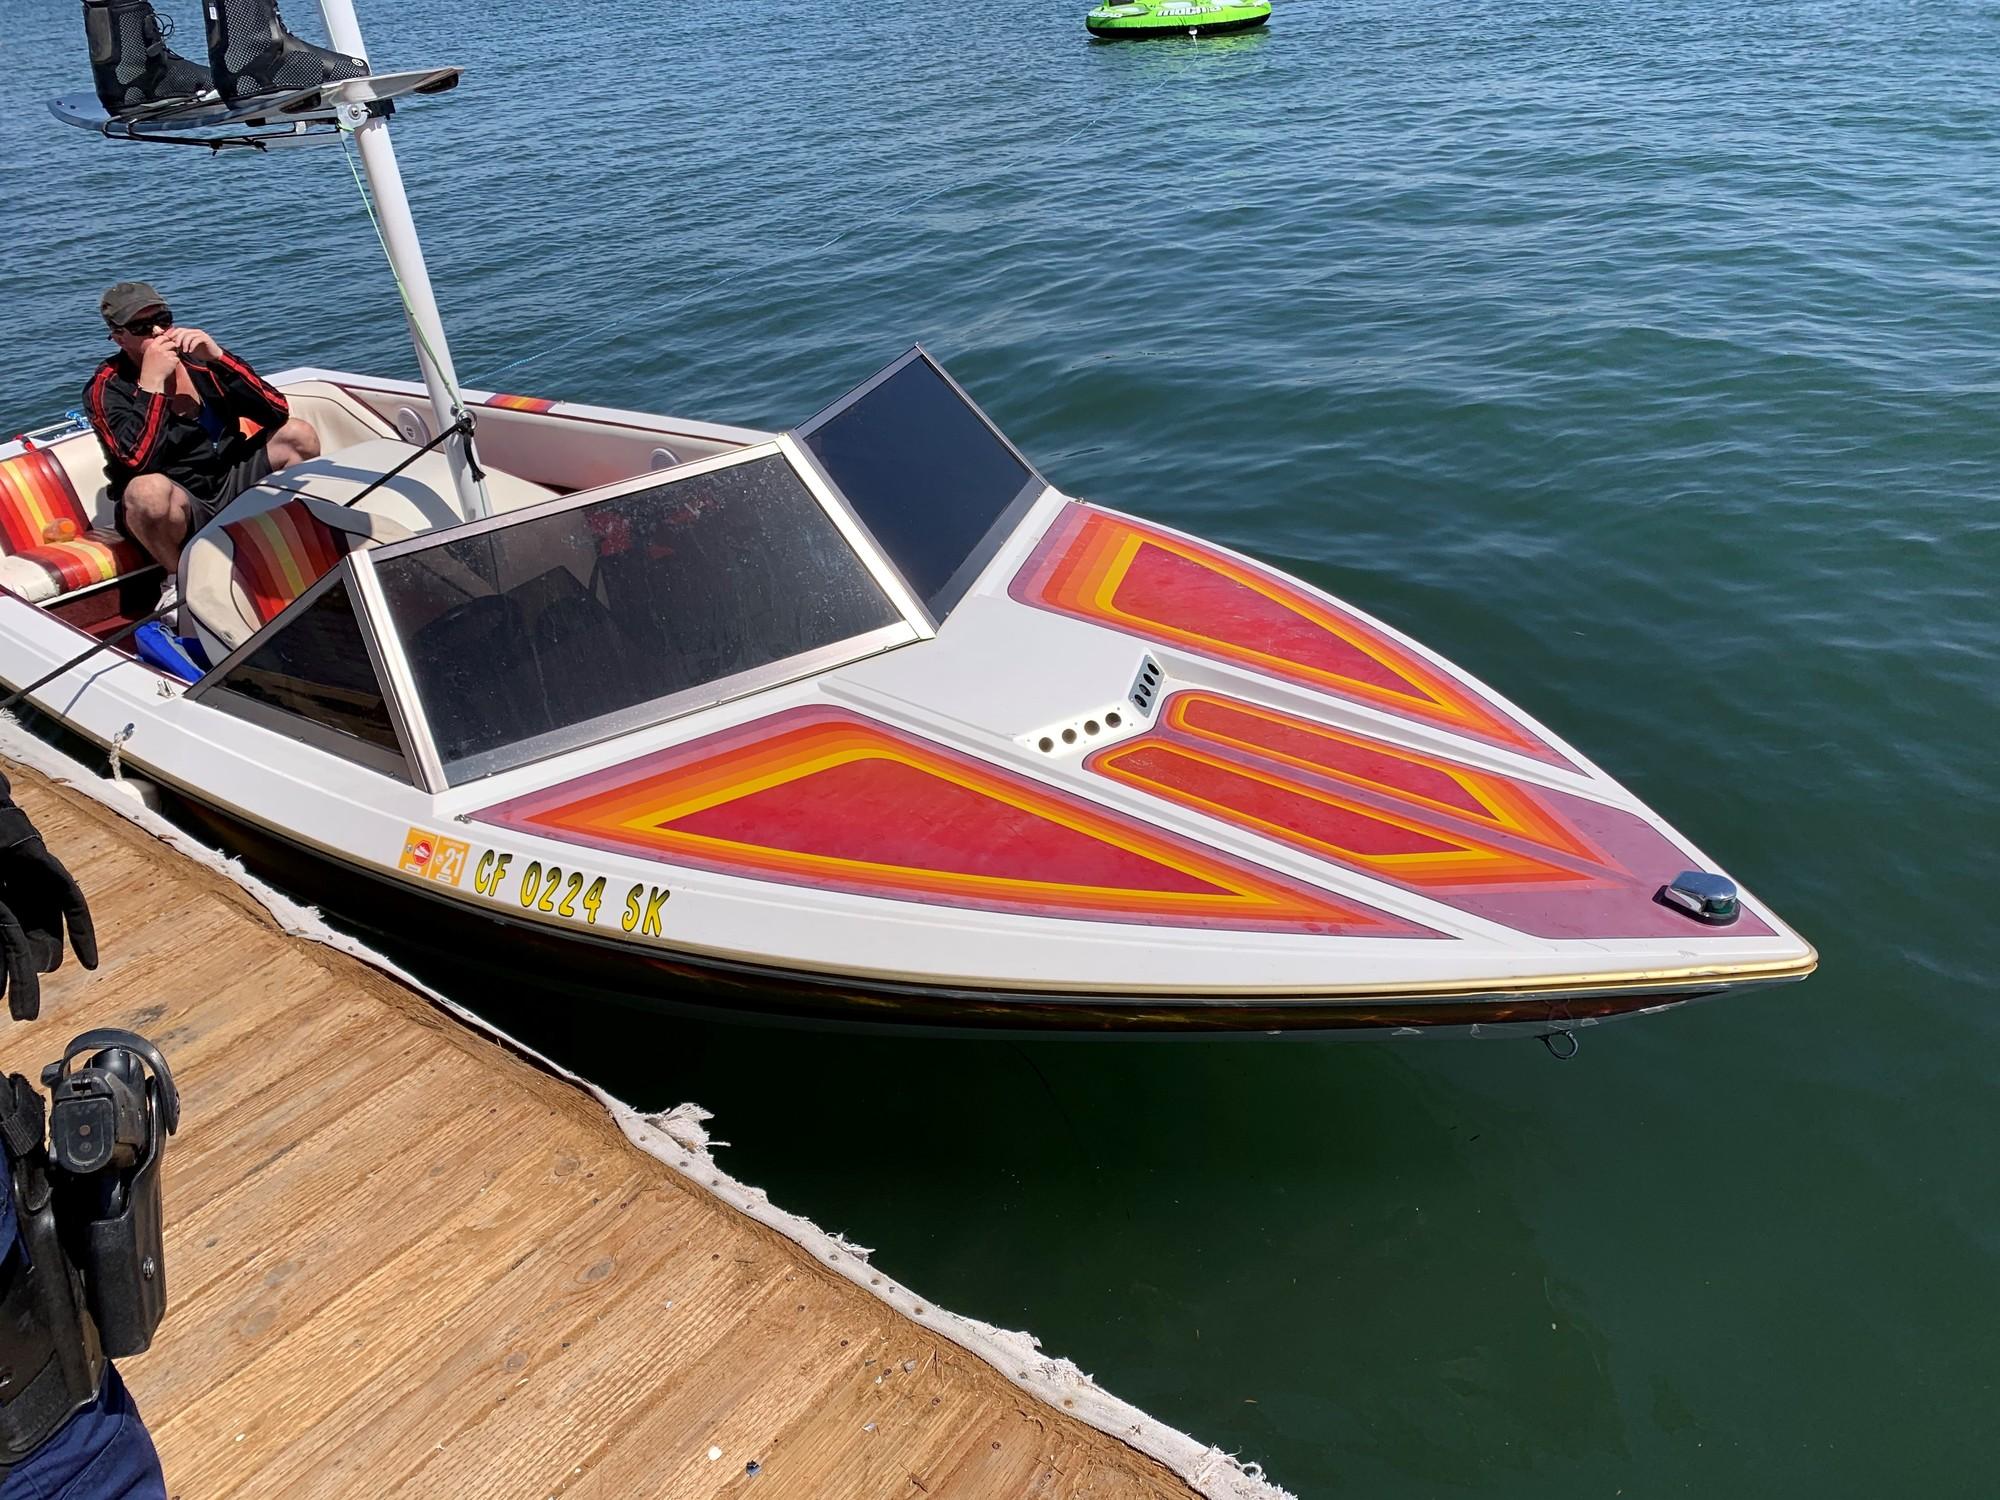 coast guard halts illegal charter in san diego